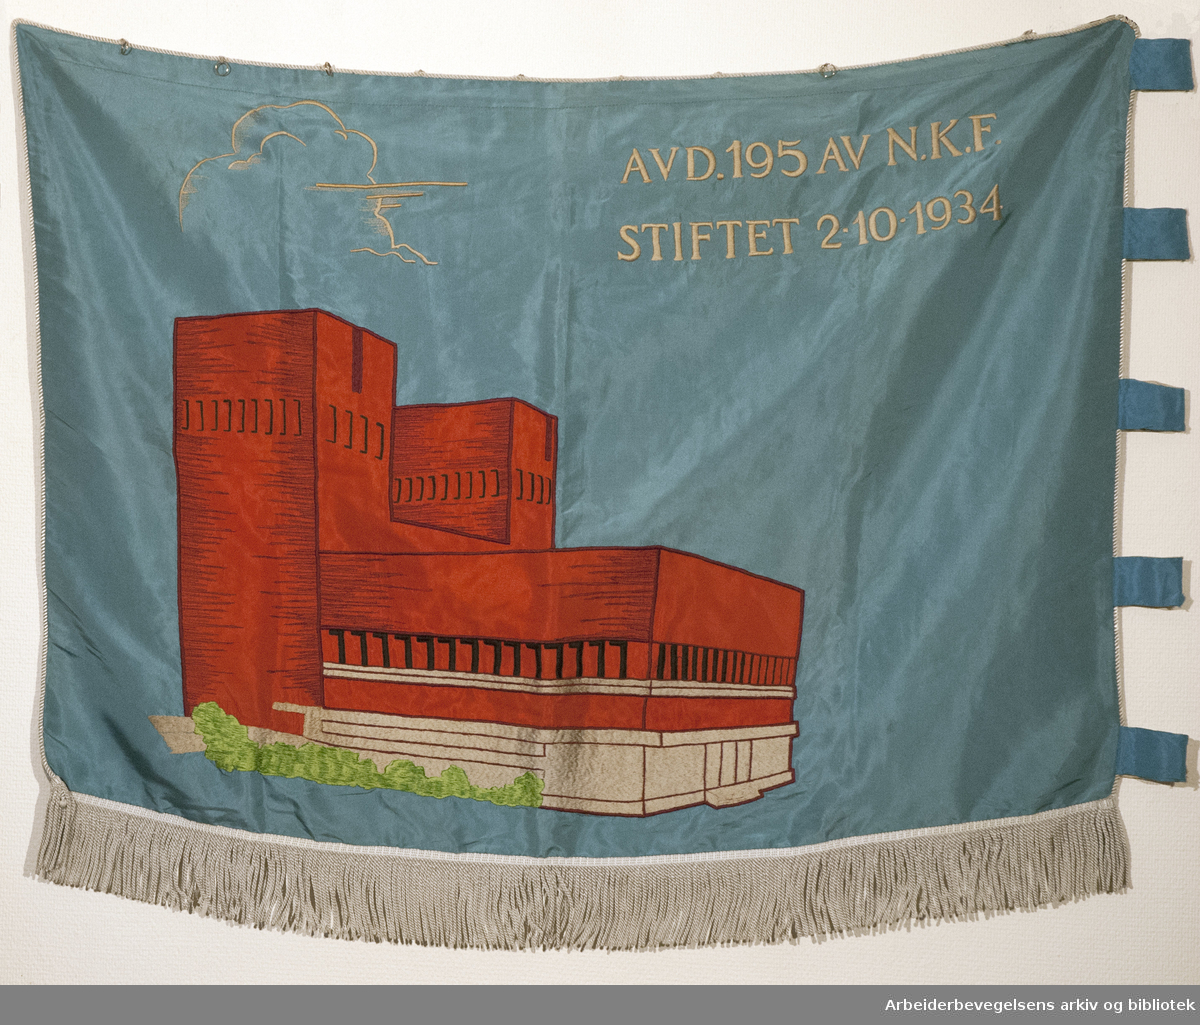 Tjenestemannsforeningen ved Rådhuset.stiftet 2. oktober 1934..Bakside..Fanetekst: .vd. 195 av NKF.Stiftet 2. 10. 1934